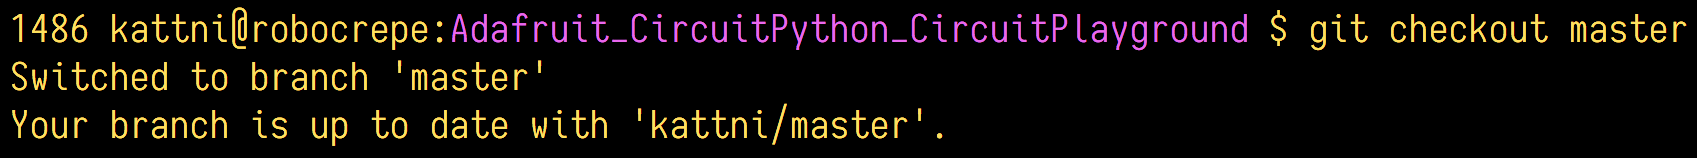 circuitpython_GitBranchCheckoutMaster.png